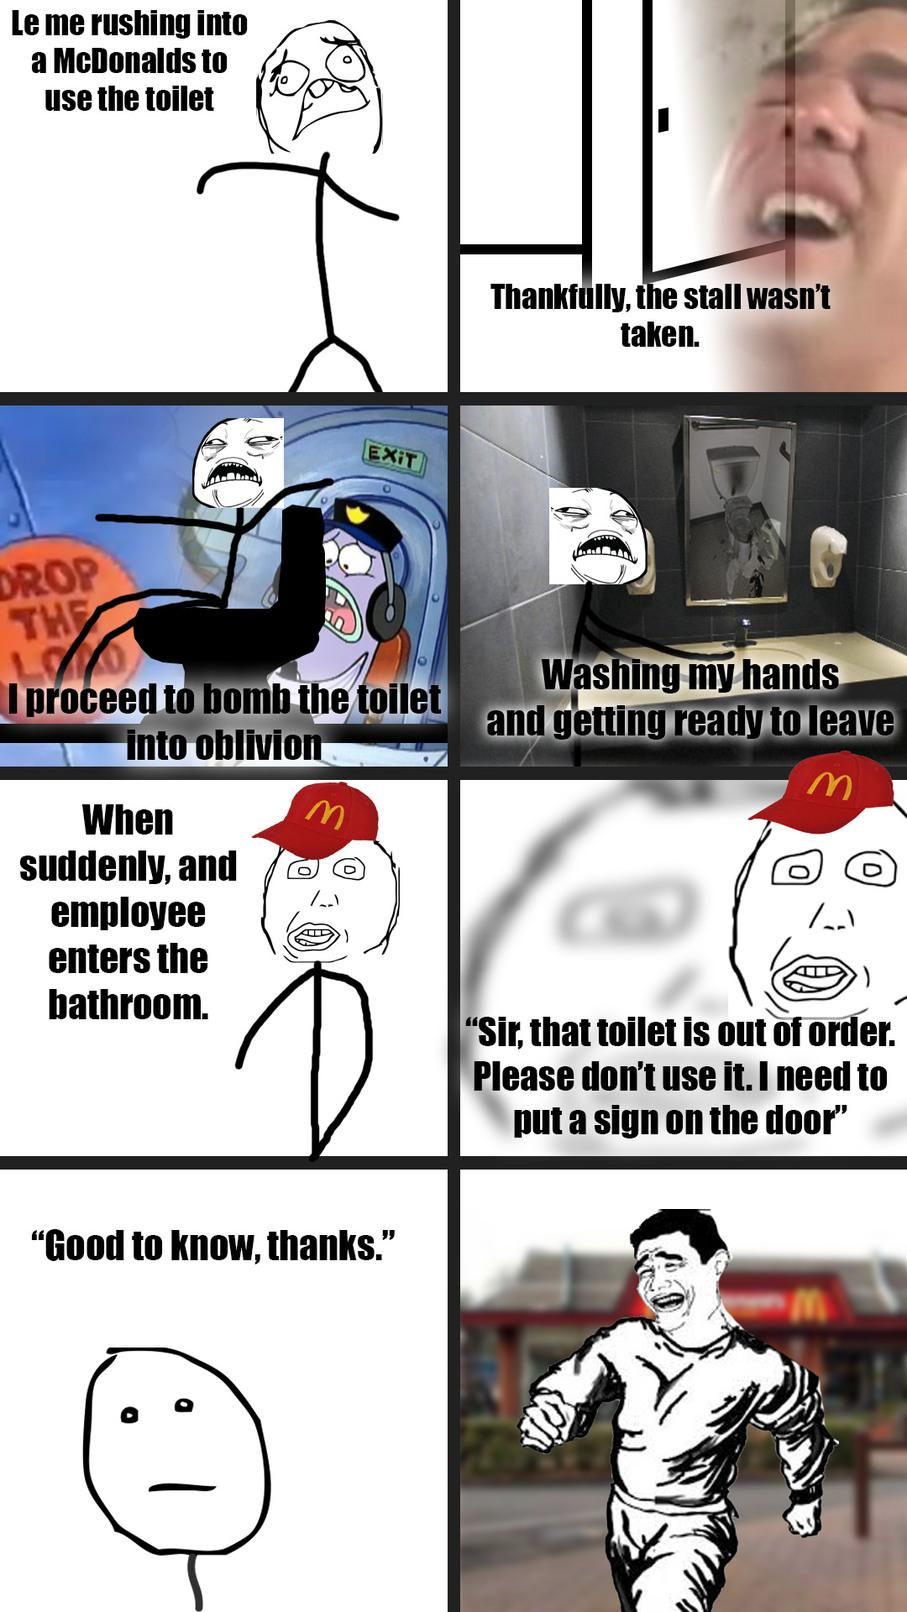 Mcdonalds true story - meme